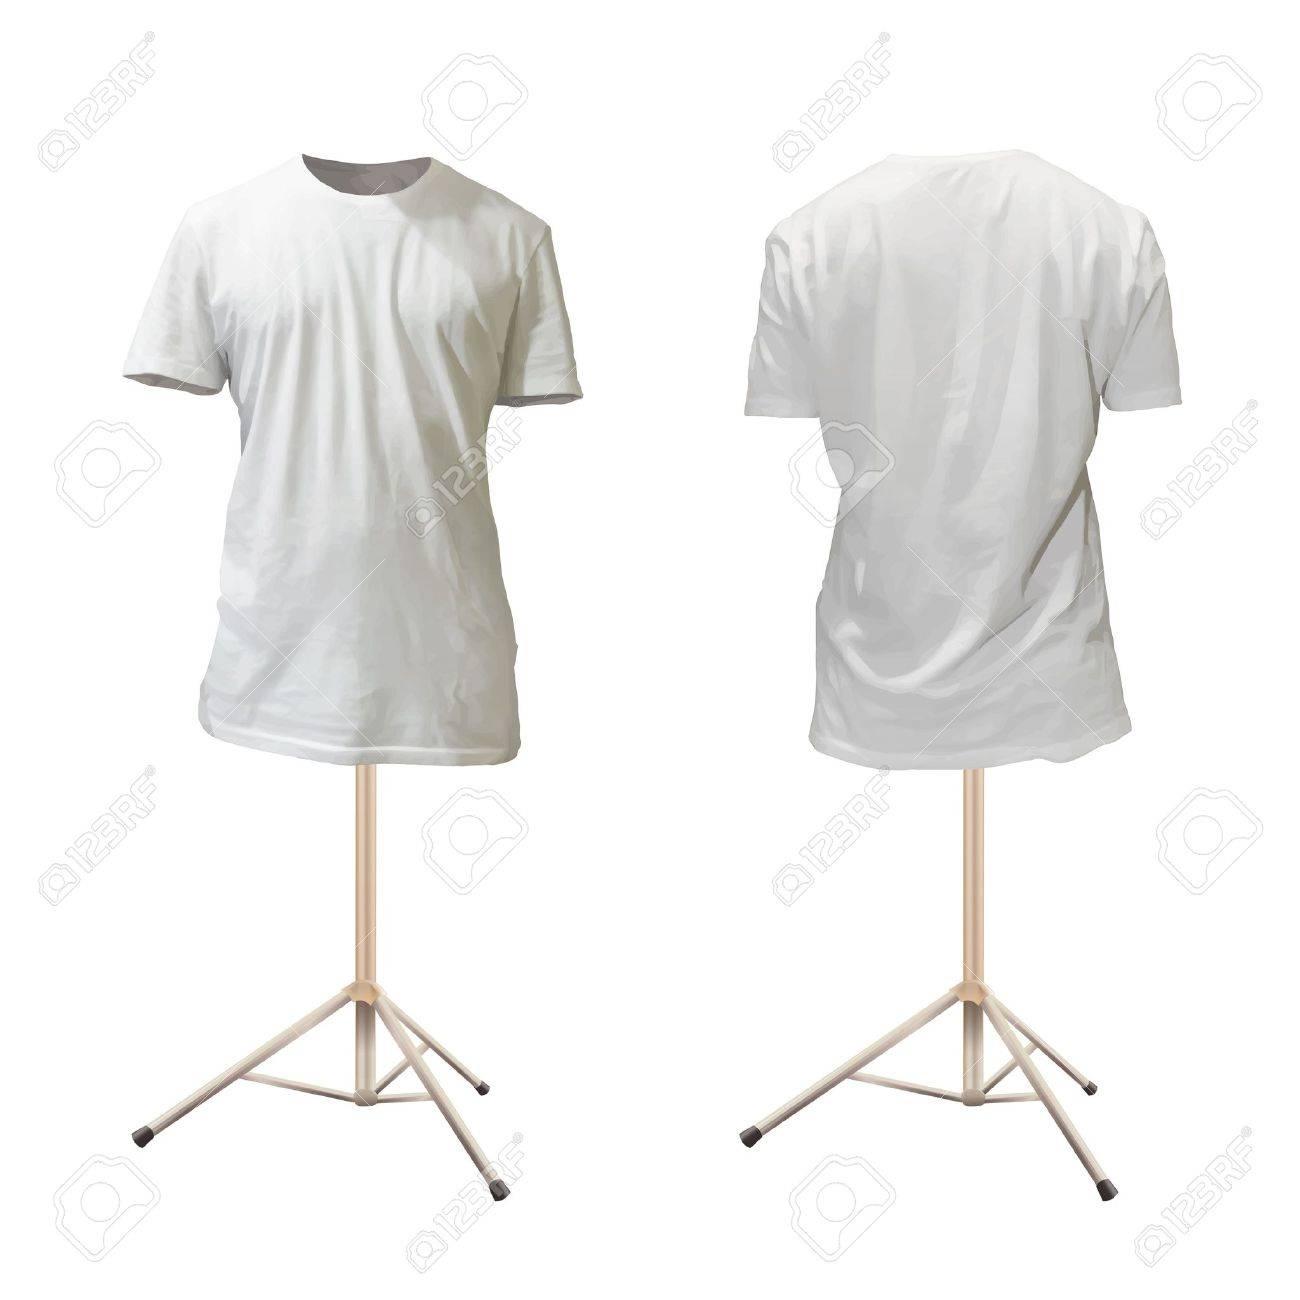 Shirt design white - Empty White Shirt Design Stock Vector 18904118